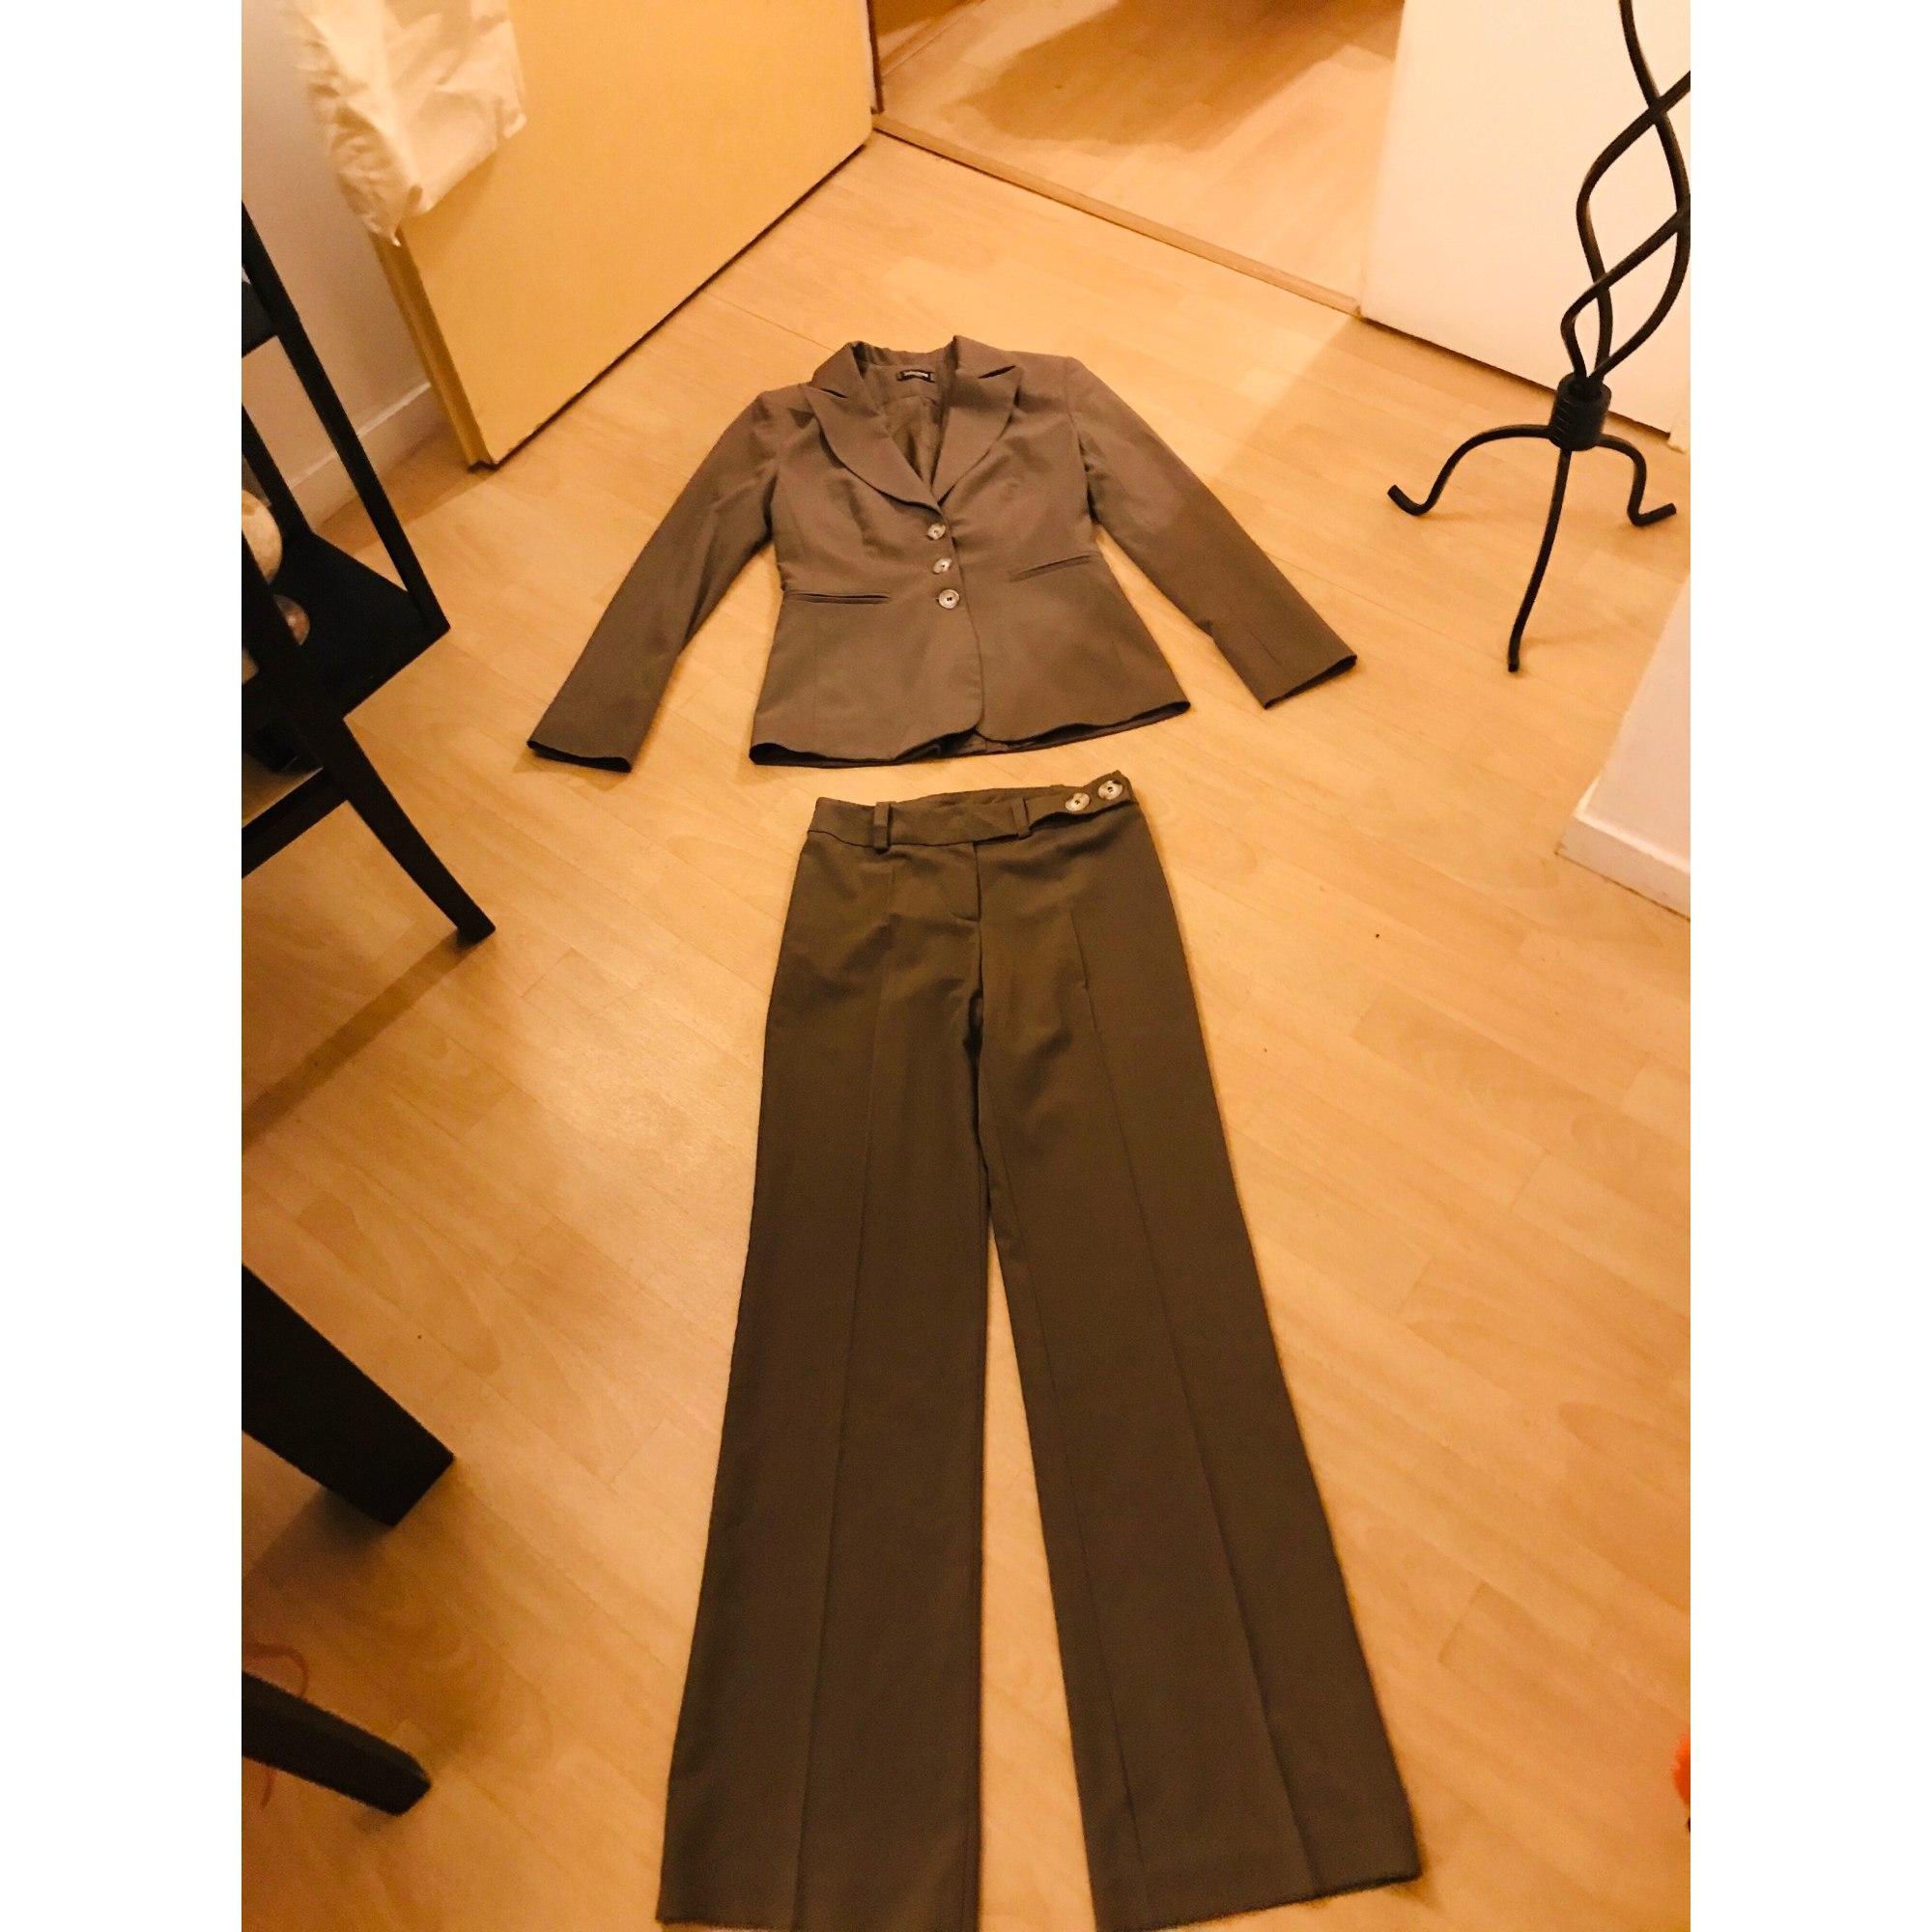 Tailleur pantalon SINÉQUANONE Kaki